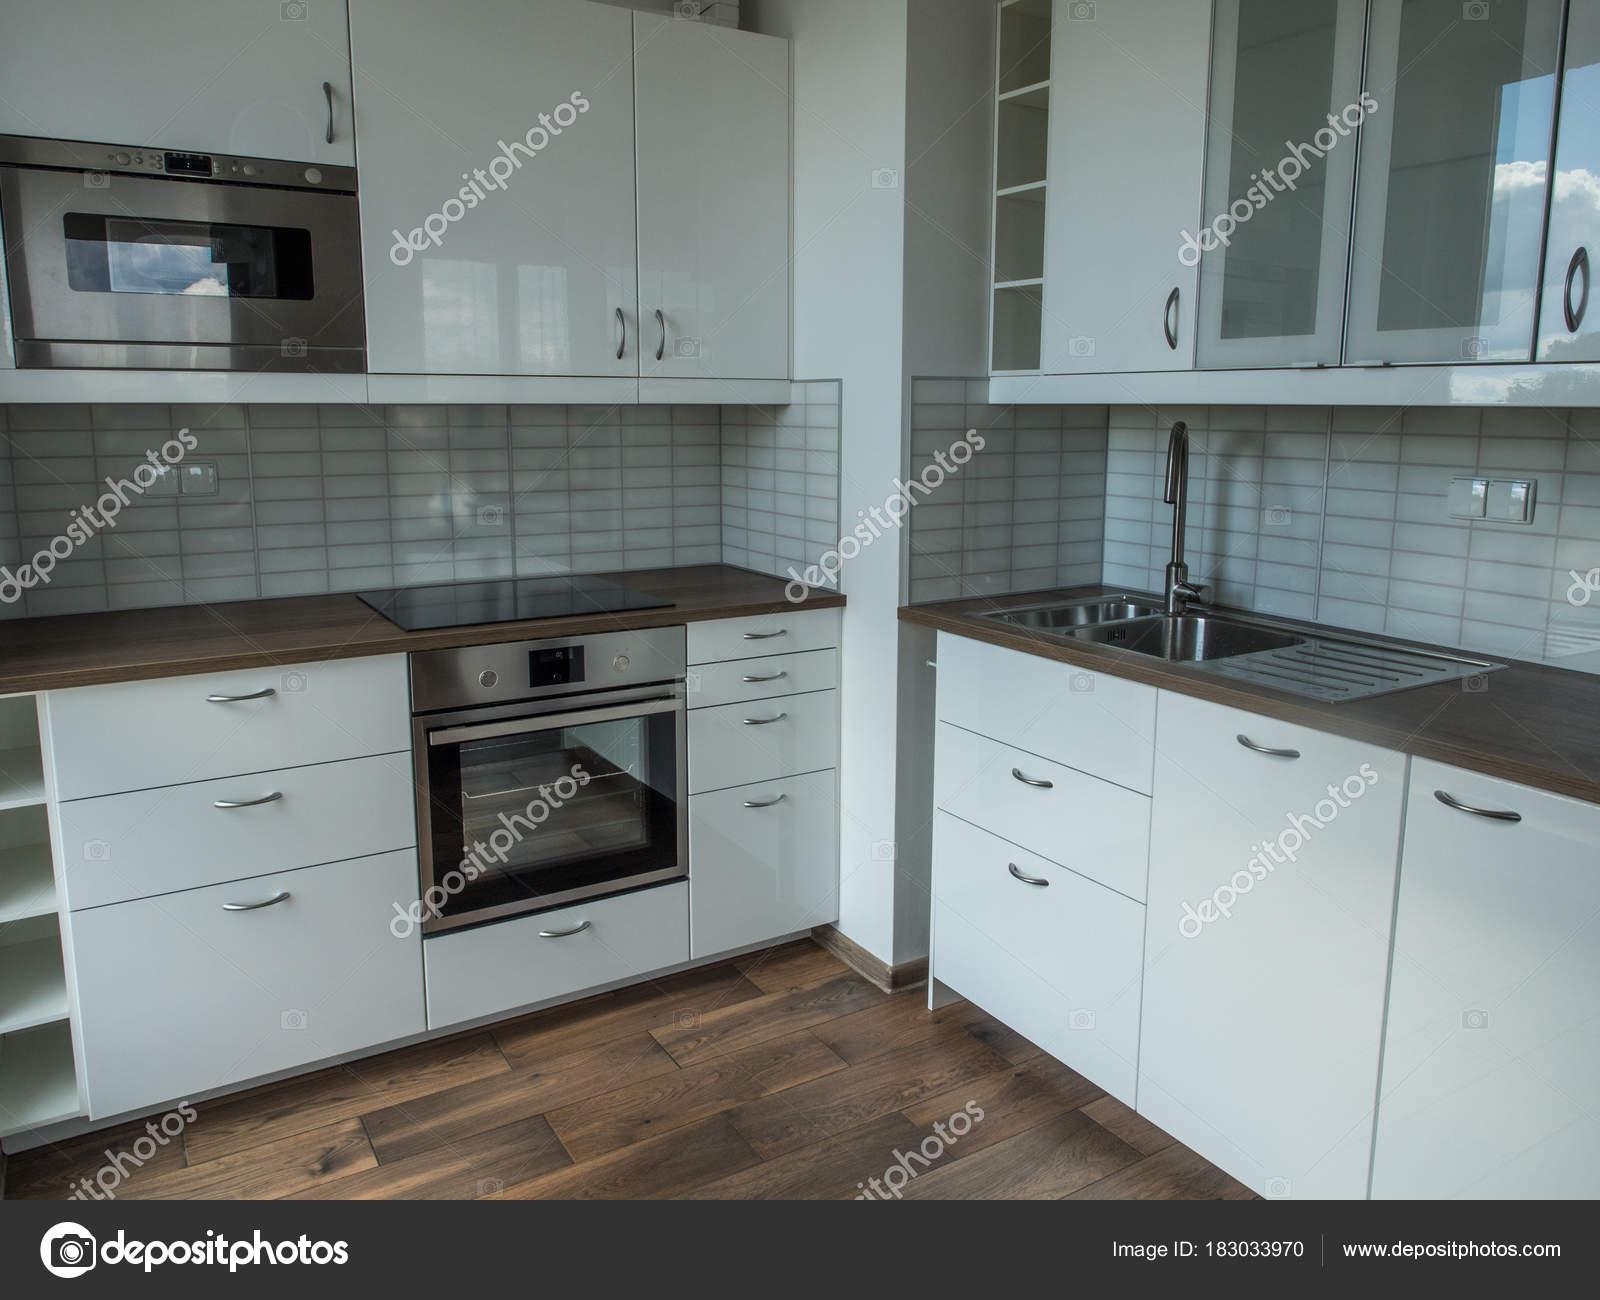 Keuken u stockfoto mirek